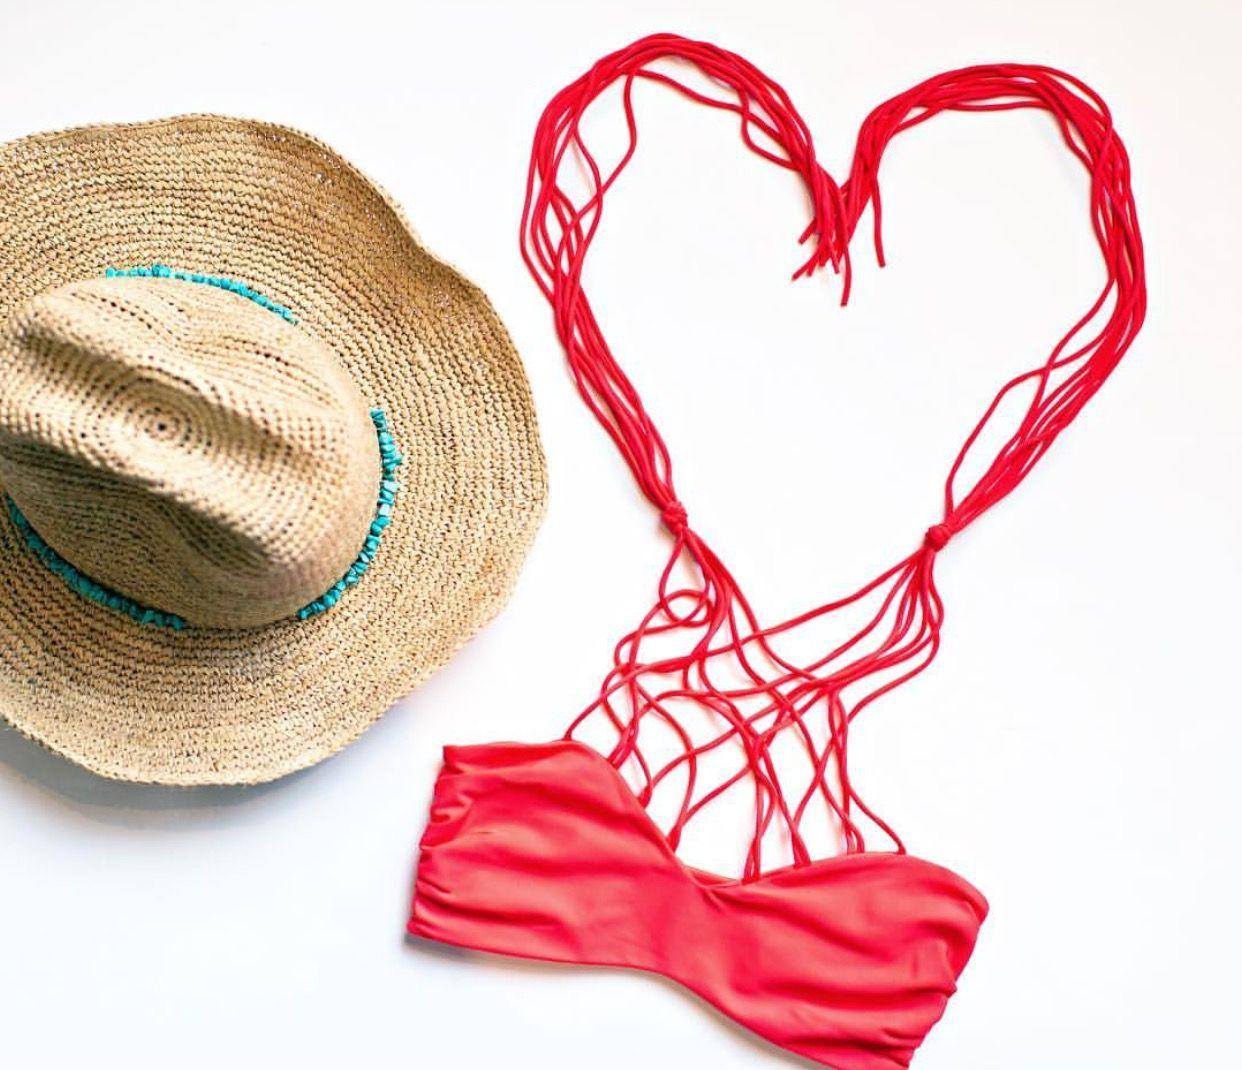 Mikoh Swimwear   Alissa Aryn Photography  | Ophelia Swimwear |  | Seacrest, FL & Seaside, FL | www.opheliaswimwear.com